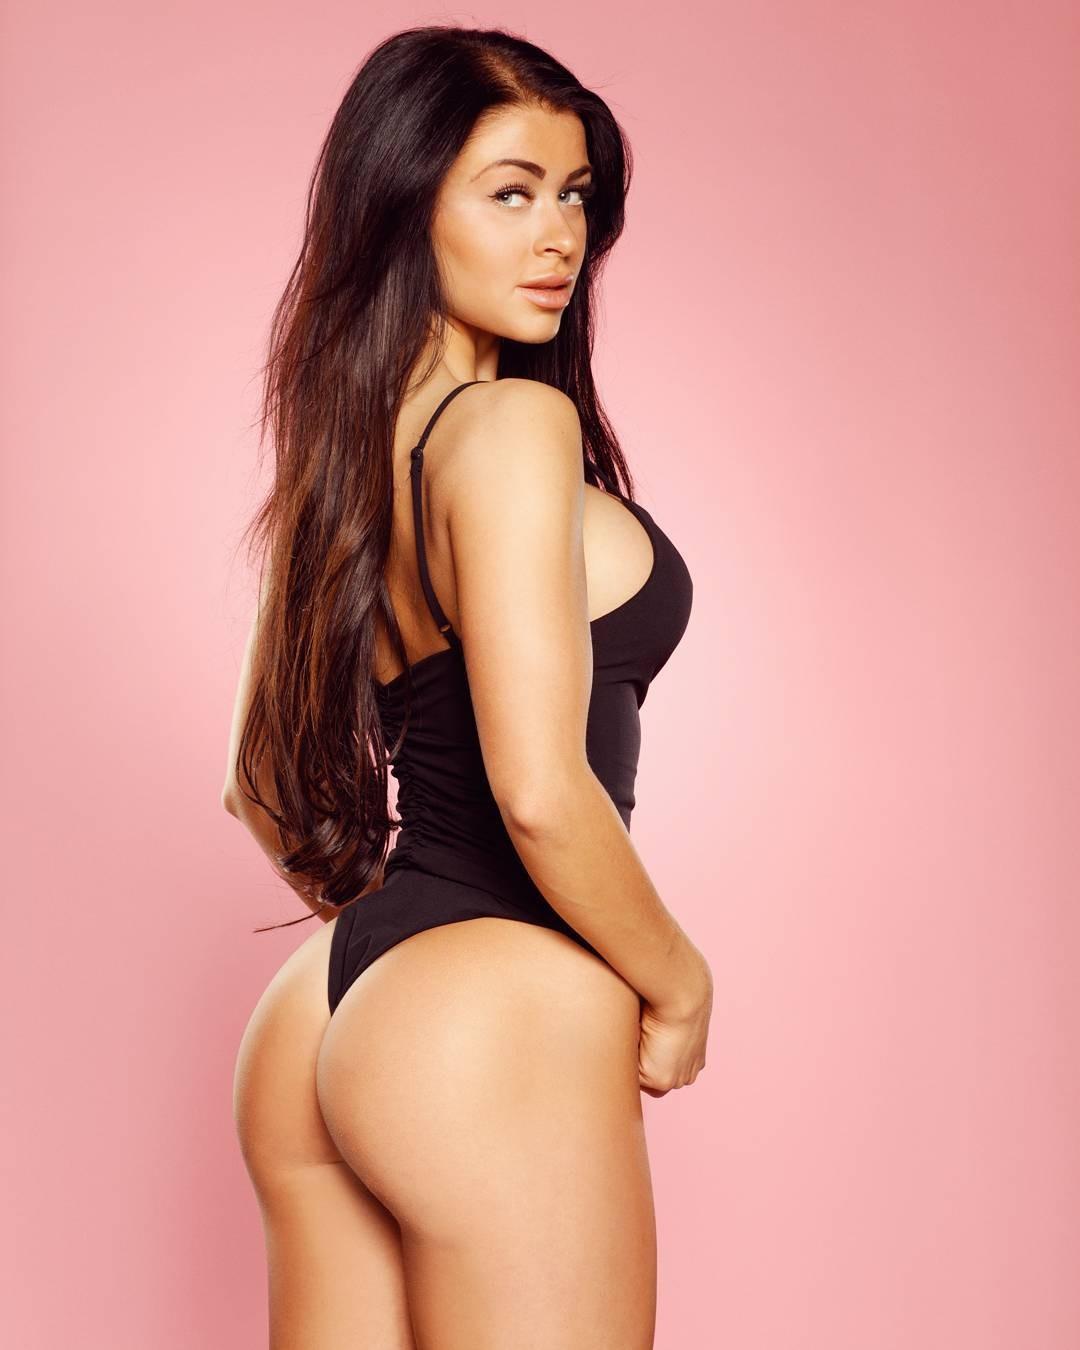 Clara Lindblom Hot Pictures, Huge Ass